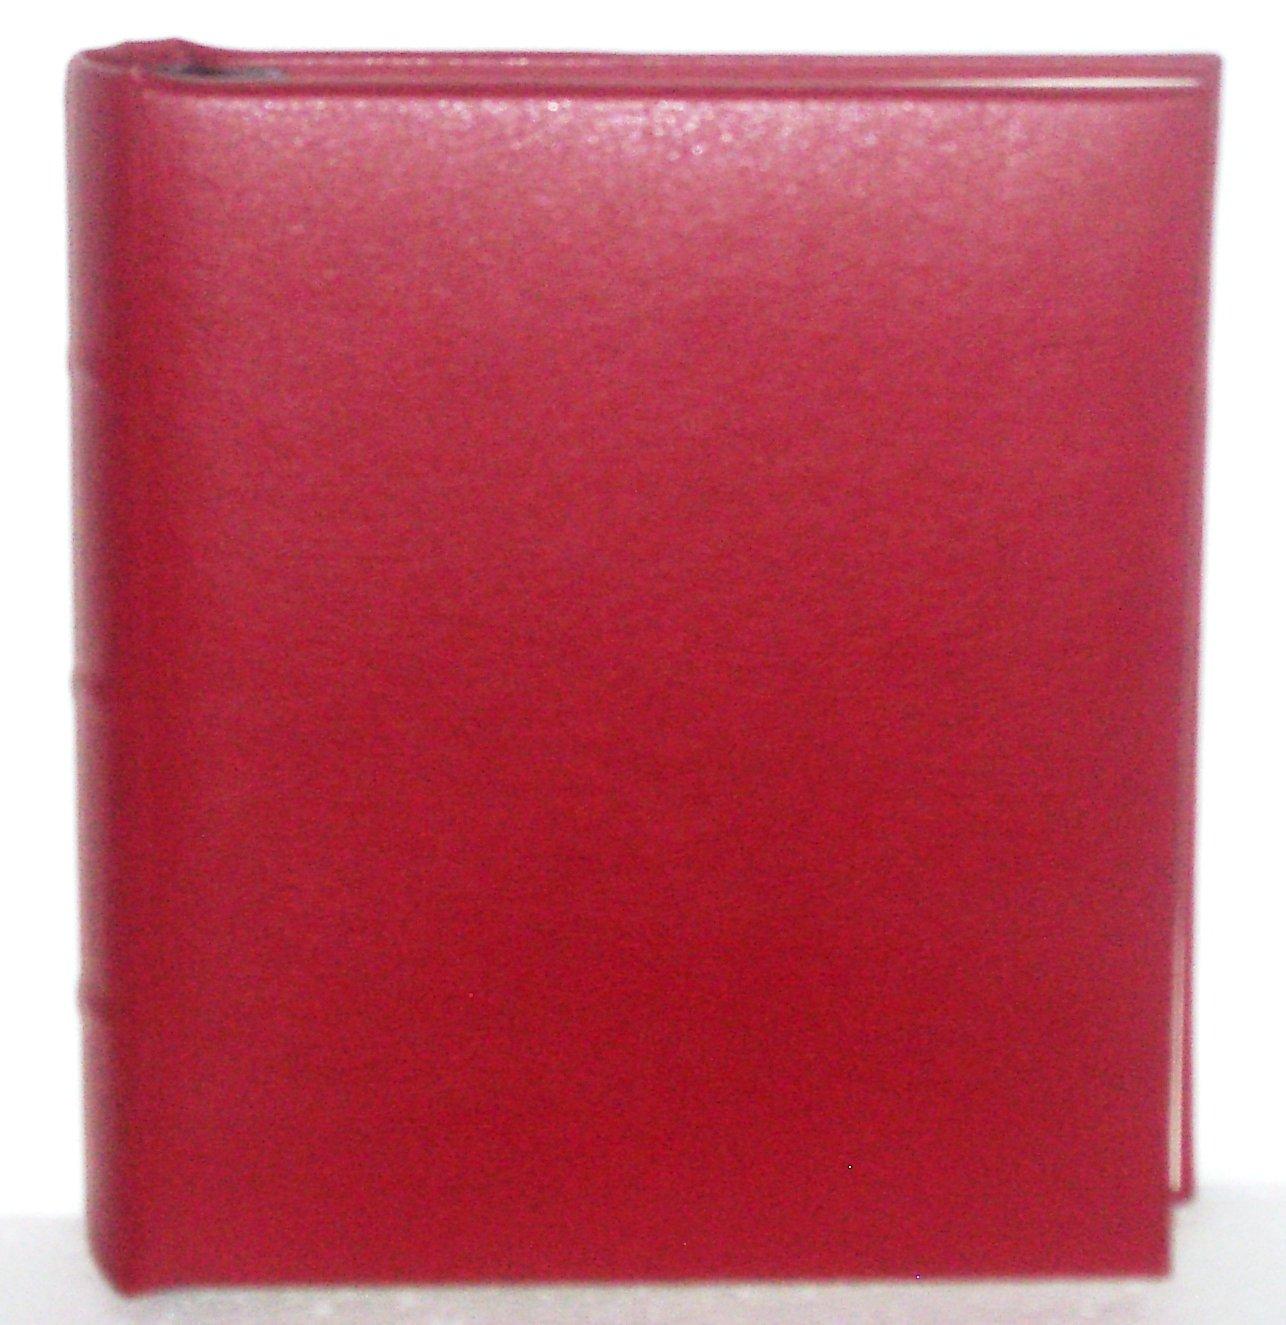 Red Mini Photo Album for 4x6 Photos